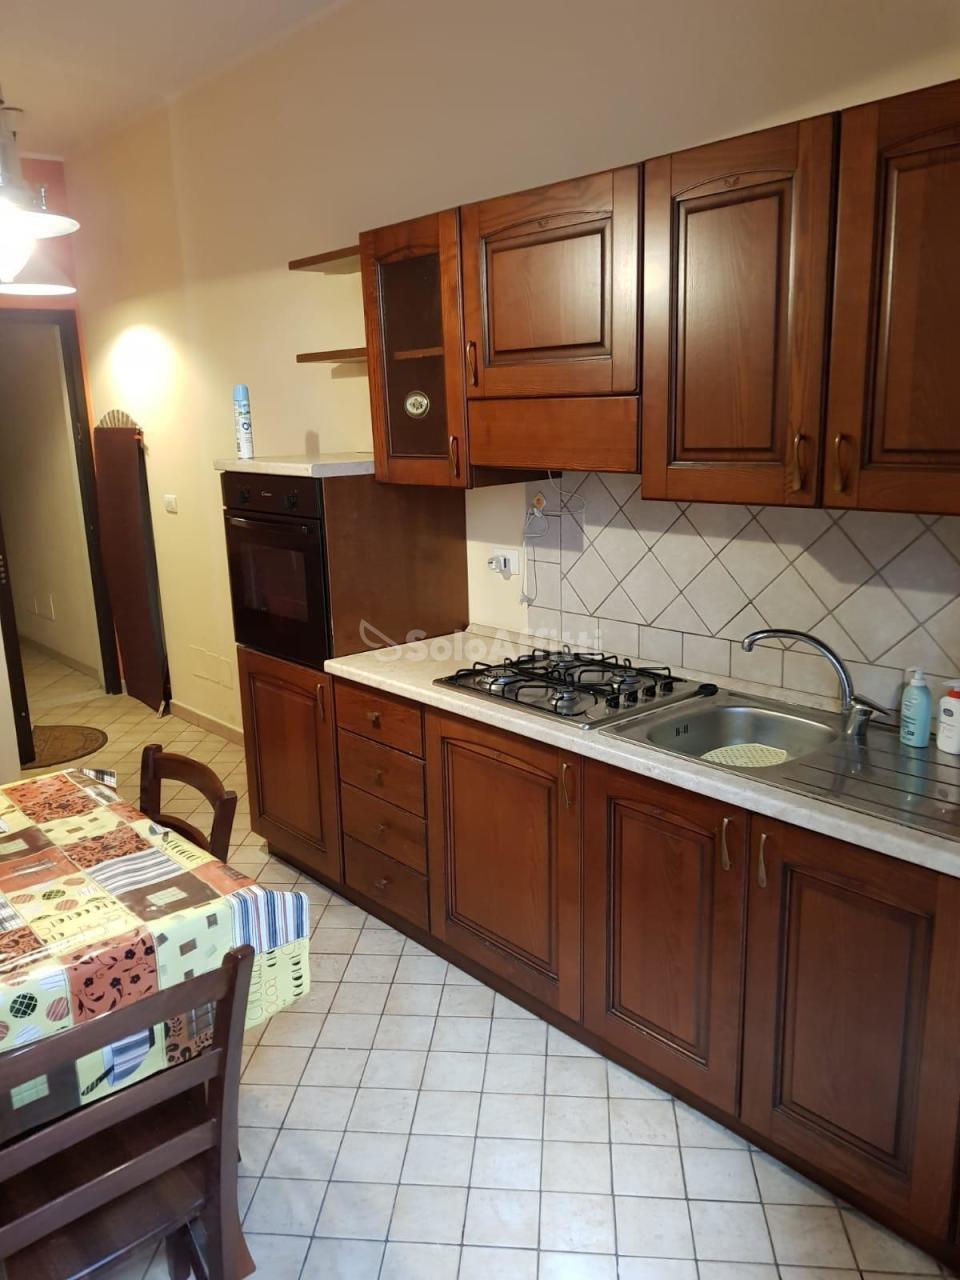 catania affitto quart: centro storico gri.vir.-immobiliare-di-grimaldi-carmine